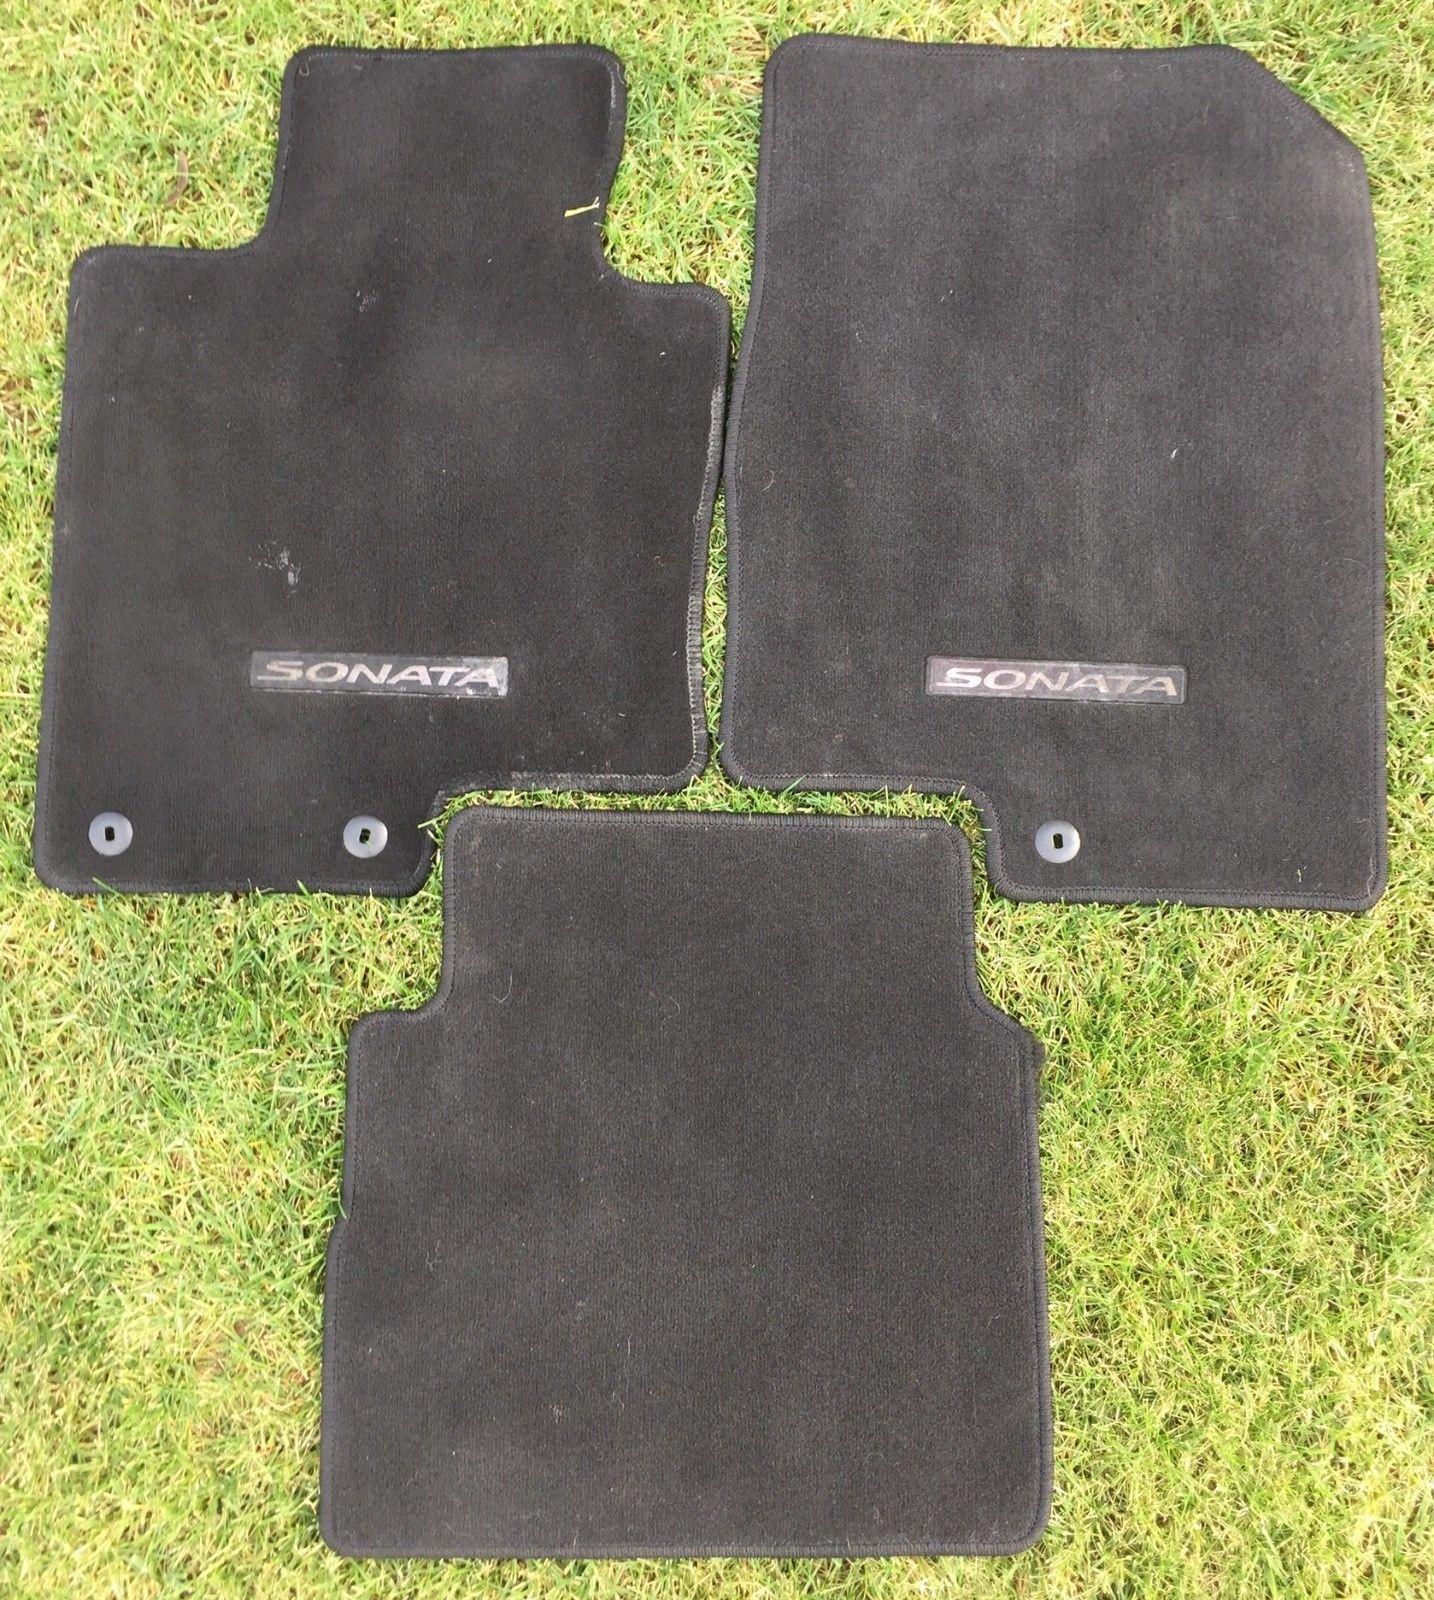 dp amazon custom front liners automotive black com set floor weathertech sonata mats buick enclave hyundai